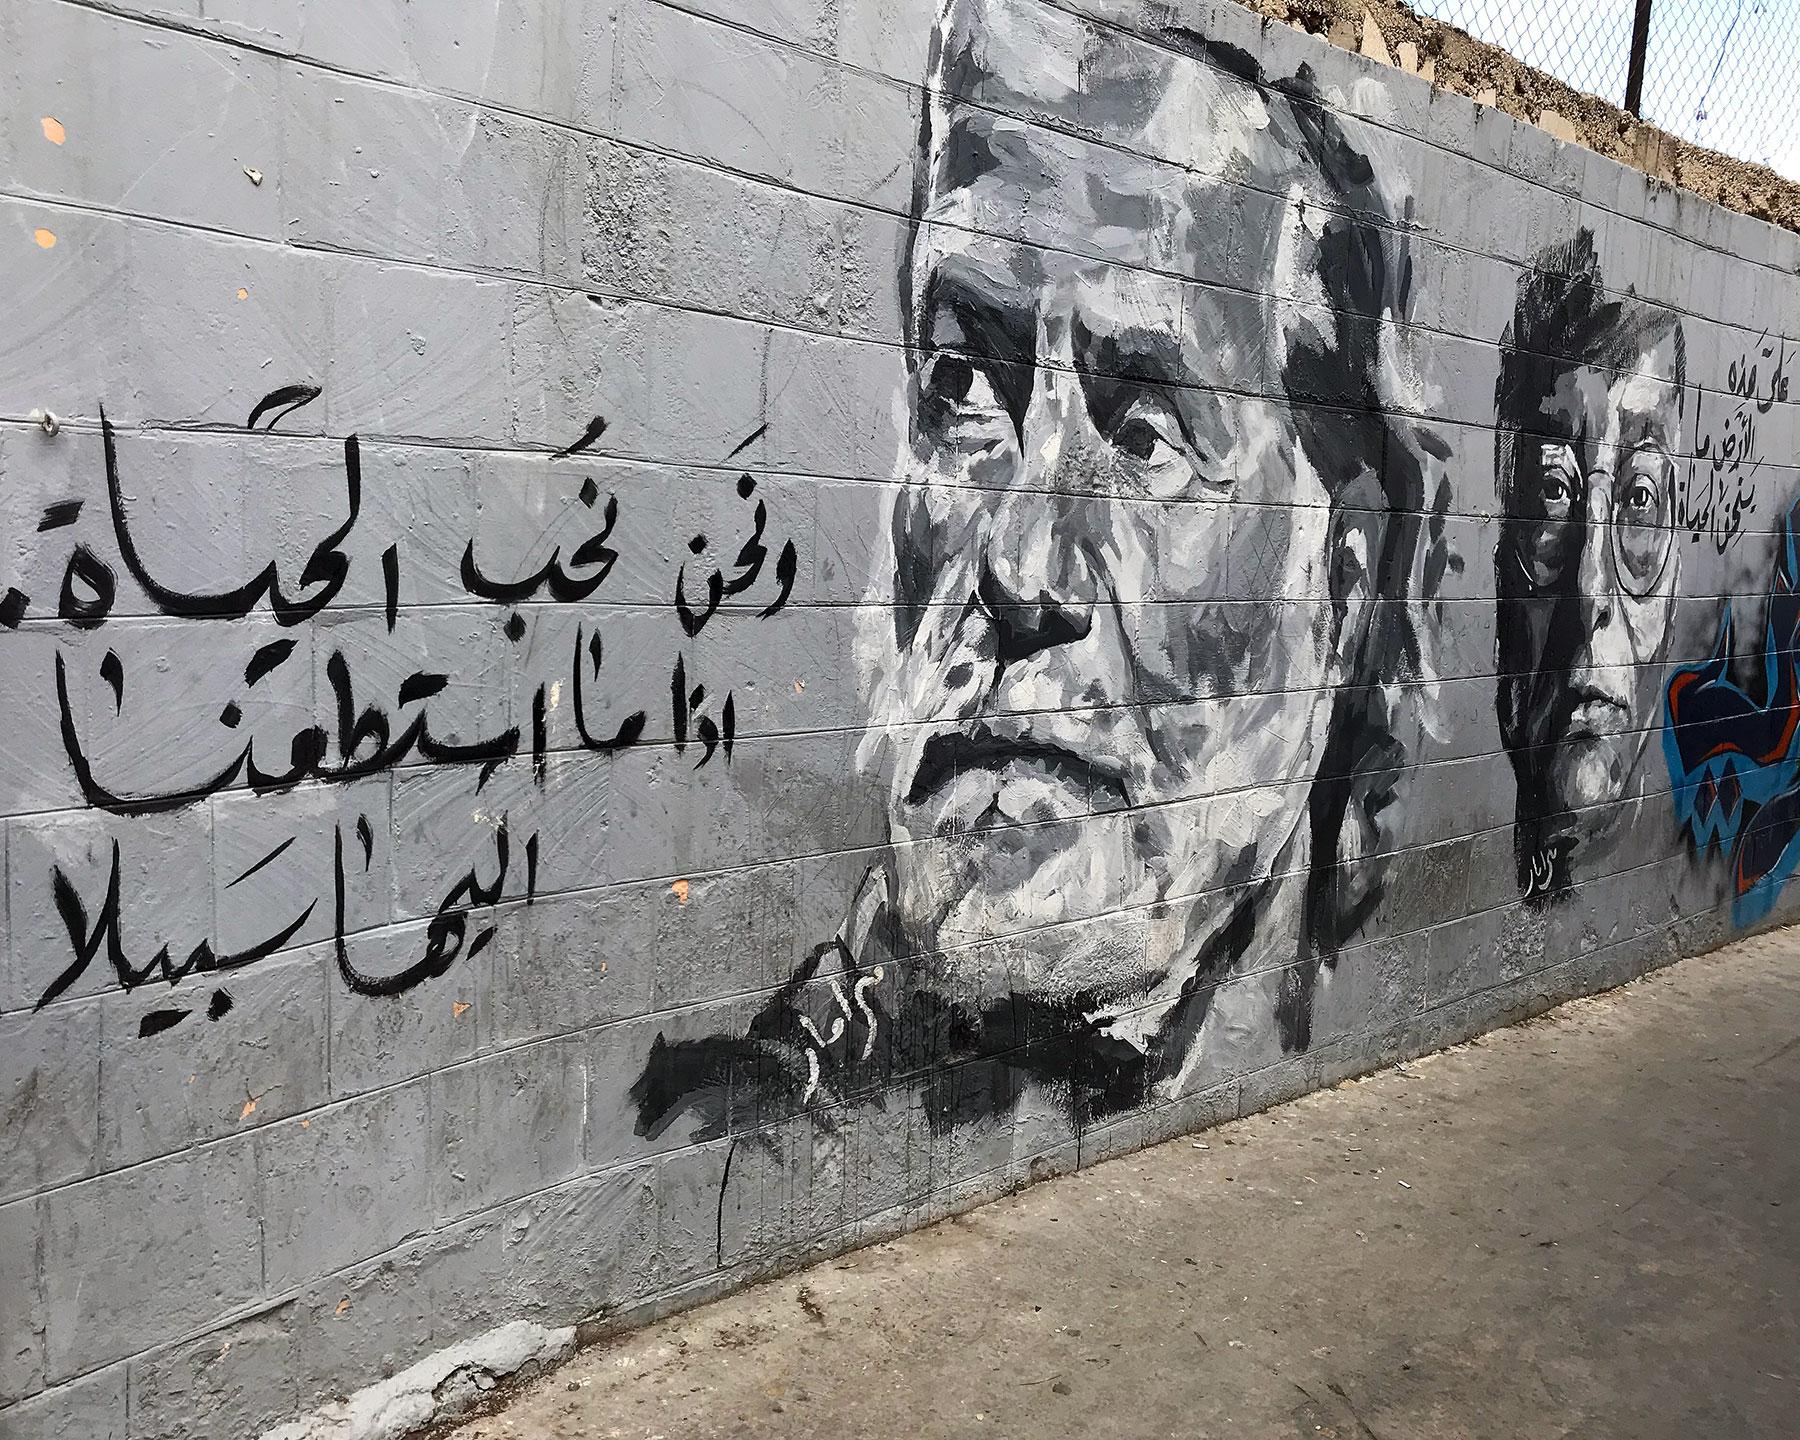 Mural of Marcel Khalife and Mahmoud Darwish along Daraj Al Kalha street in Amman, Jordan.